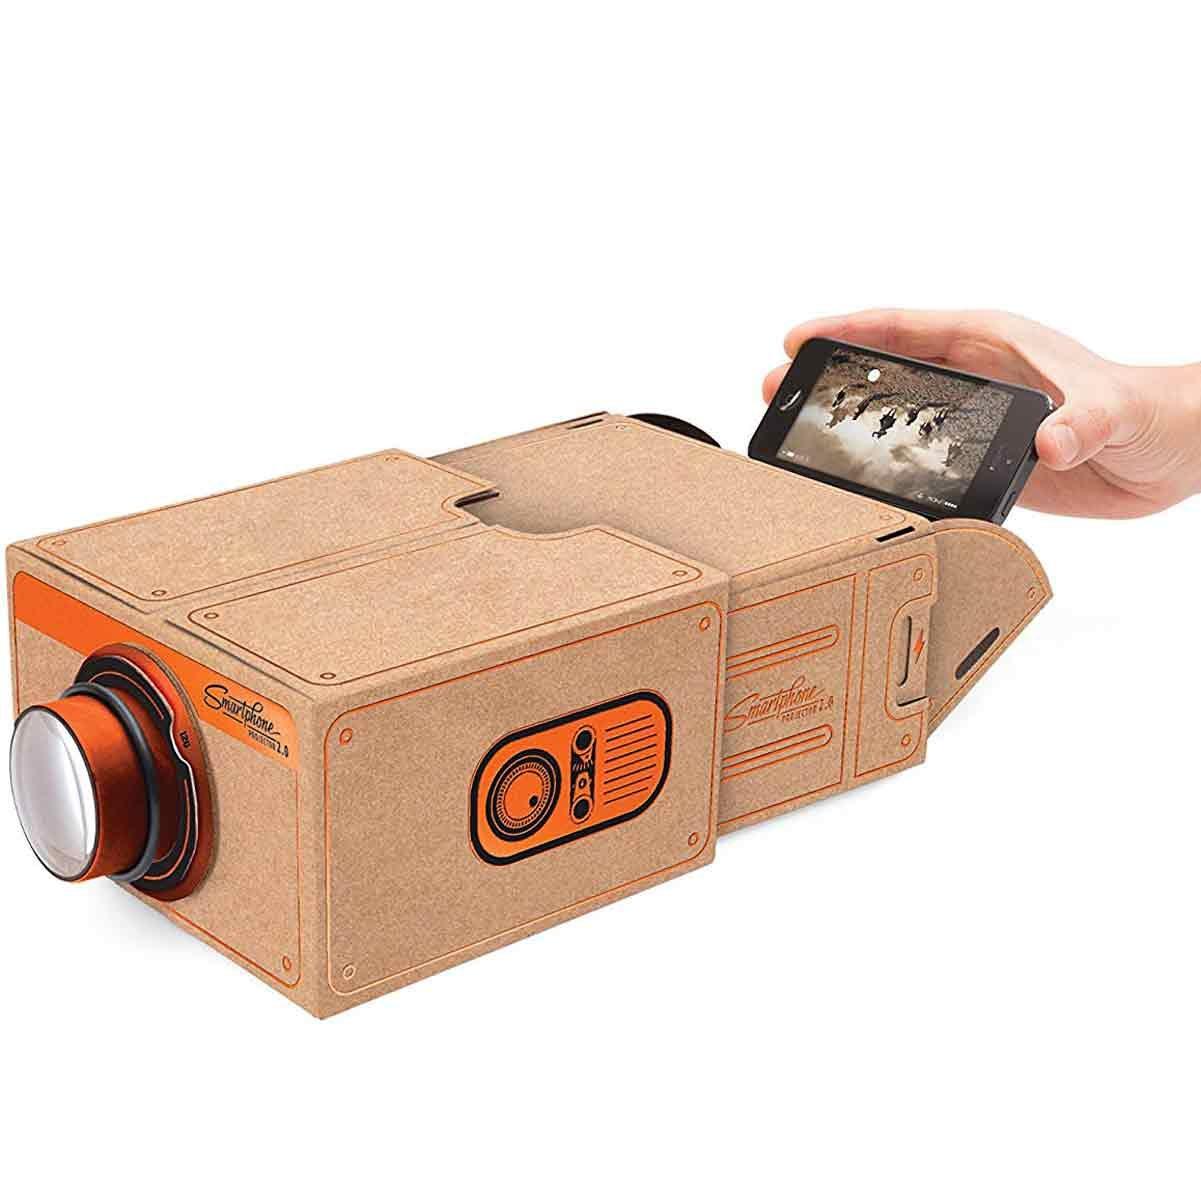 Smartphone-Projector